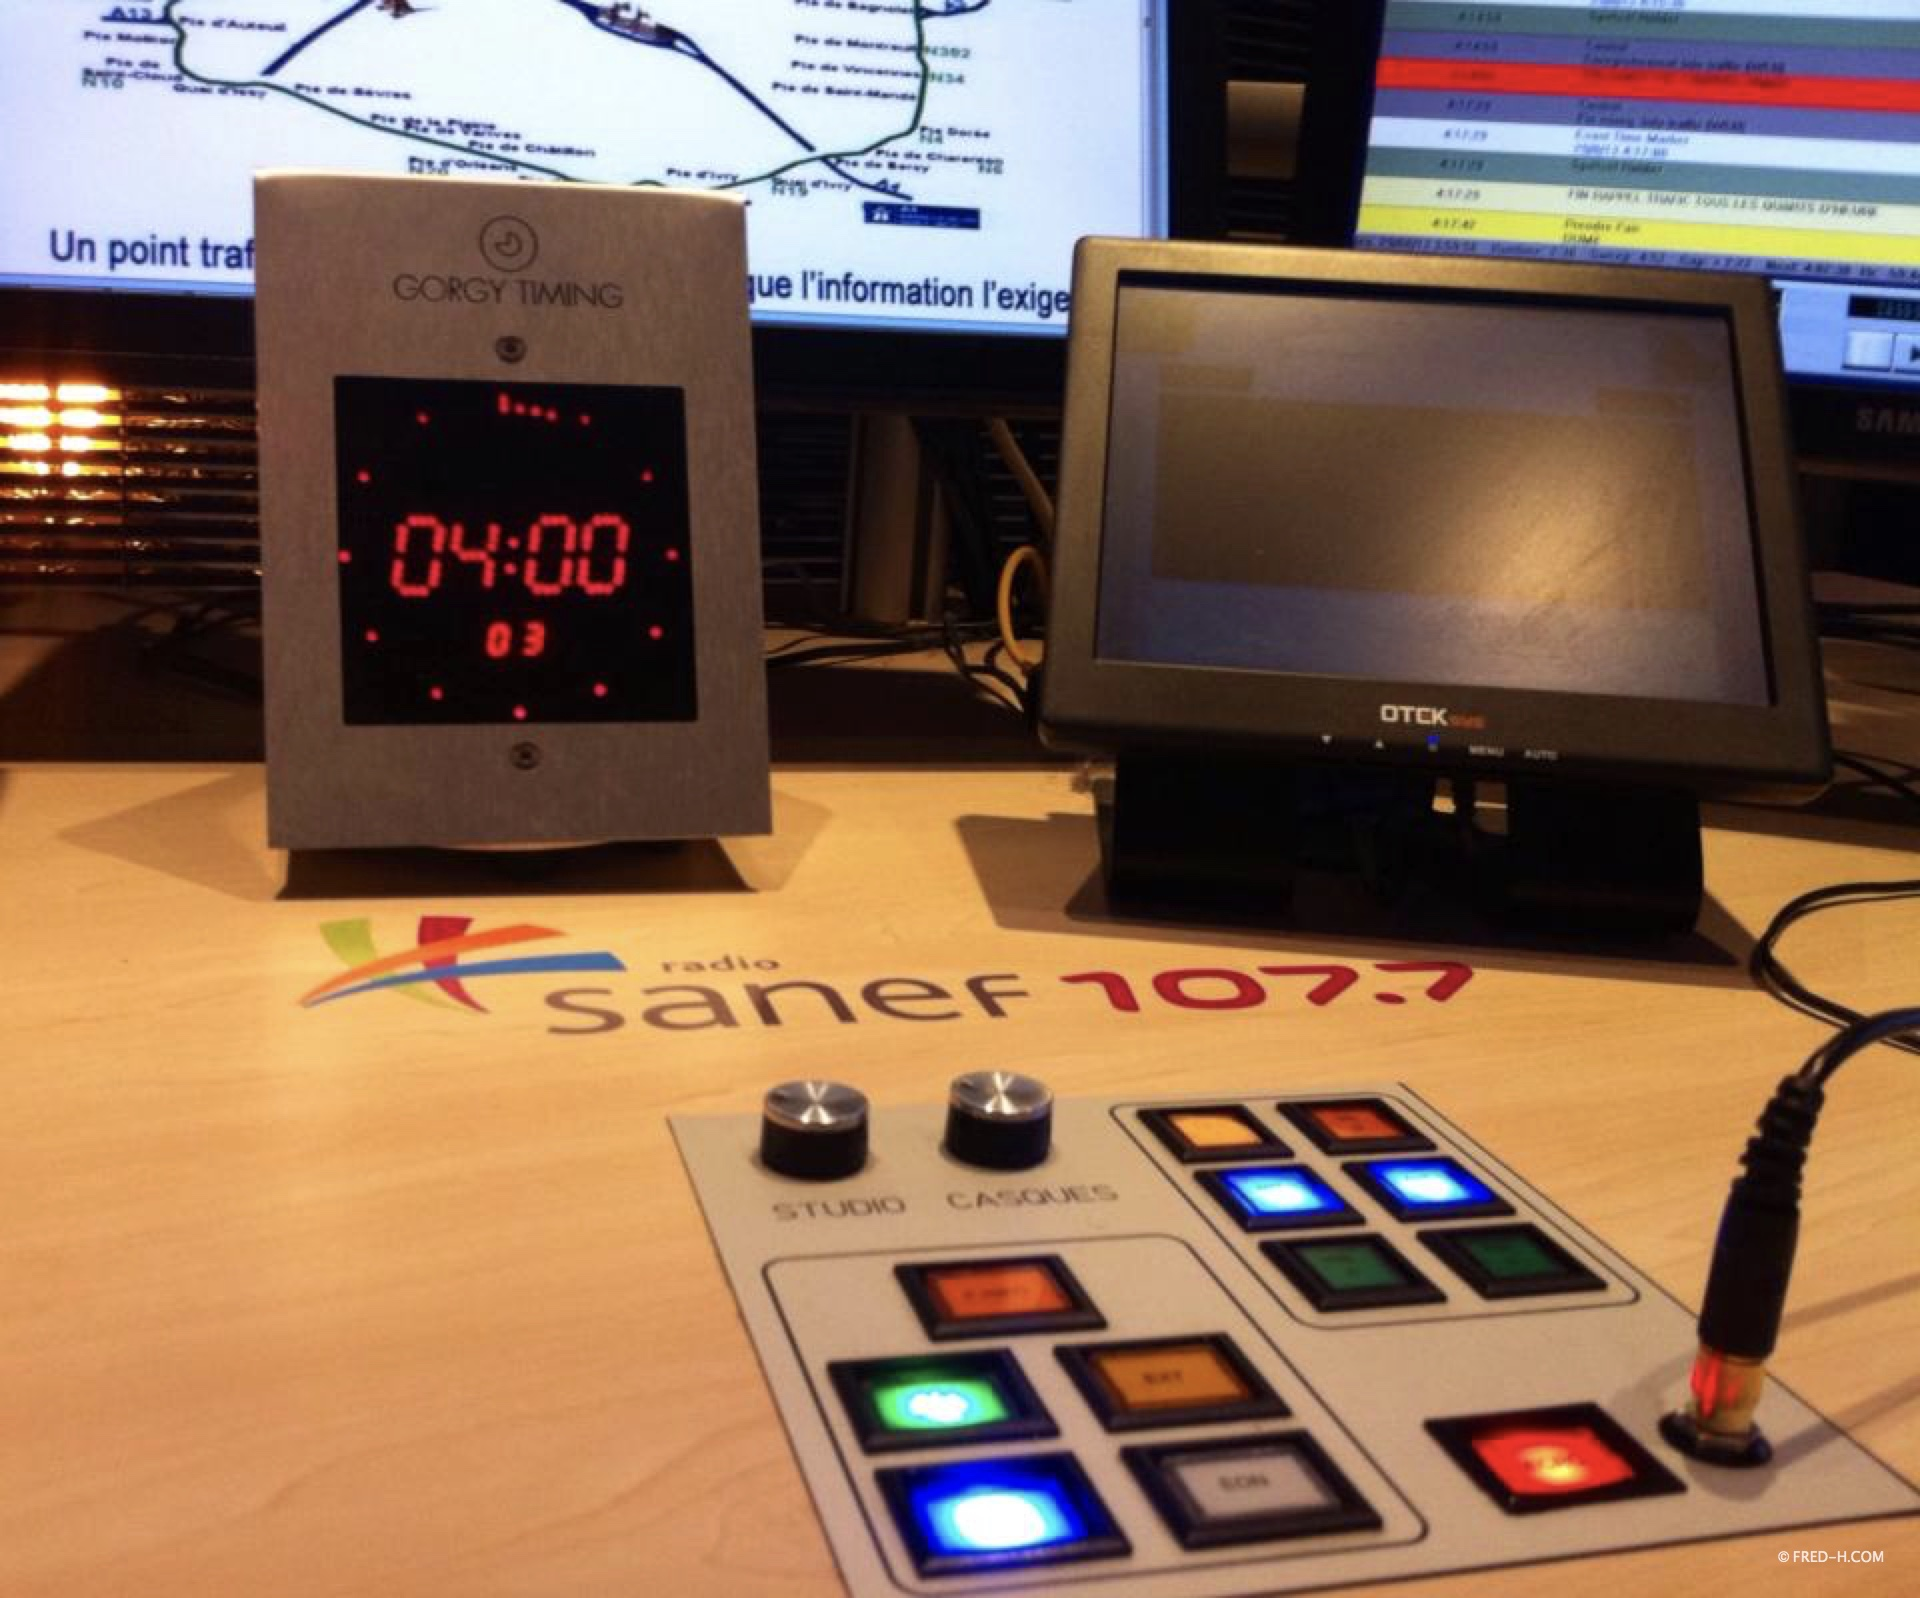 horloge radio 4h du matin studios senlis sanef 107.7 radio france